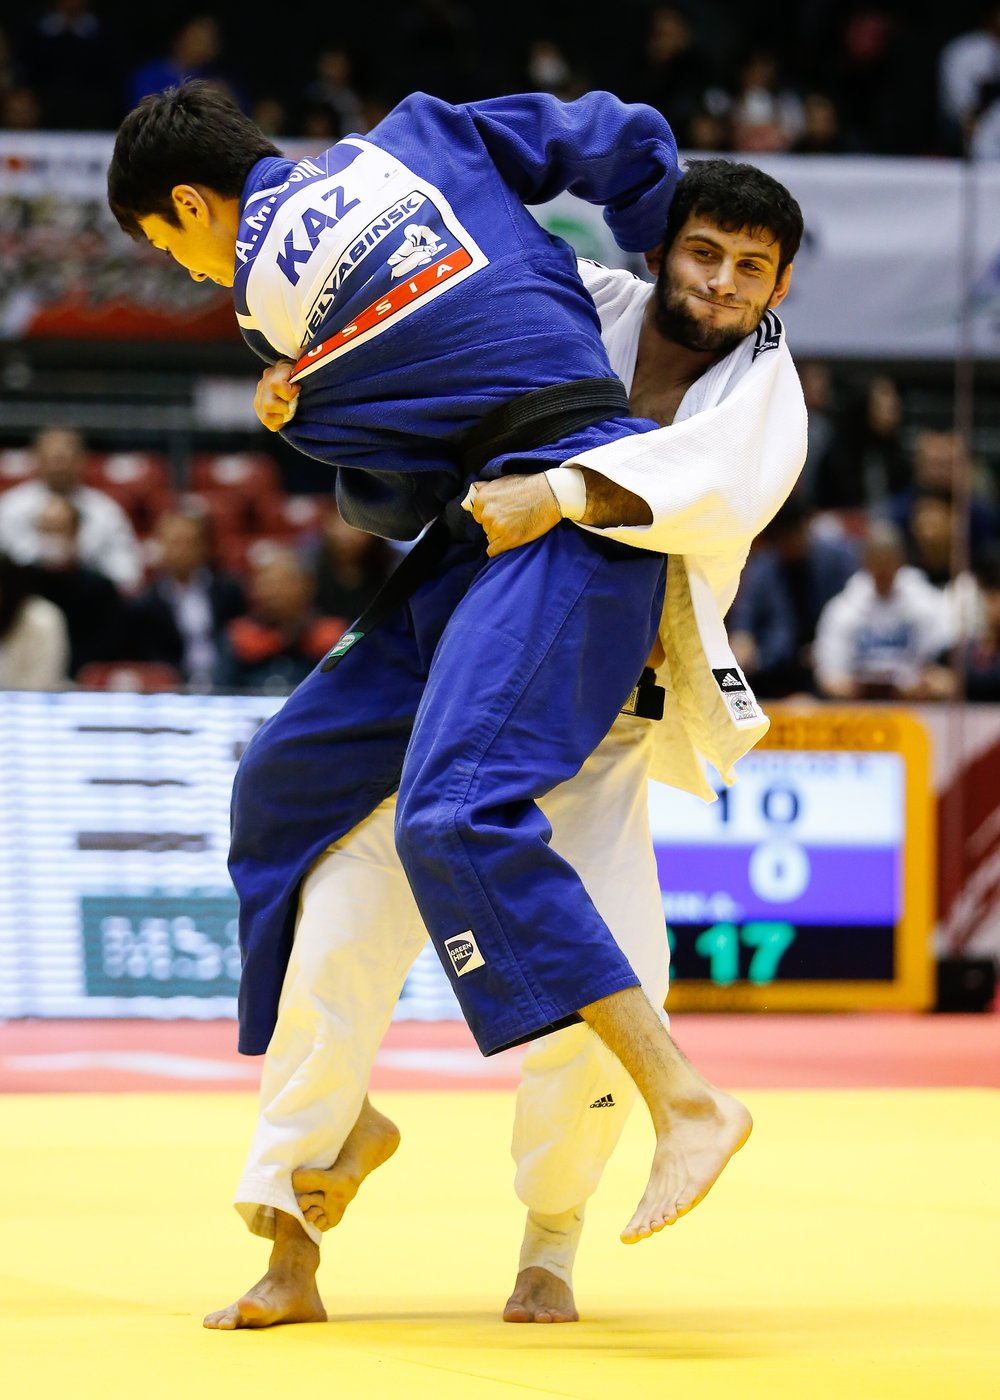 593834367CJ002_Judo_Grand_S.JPG